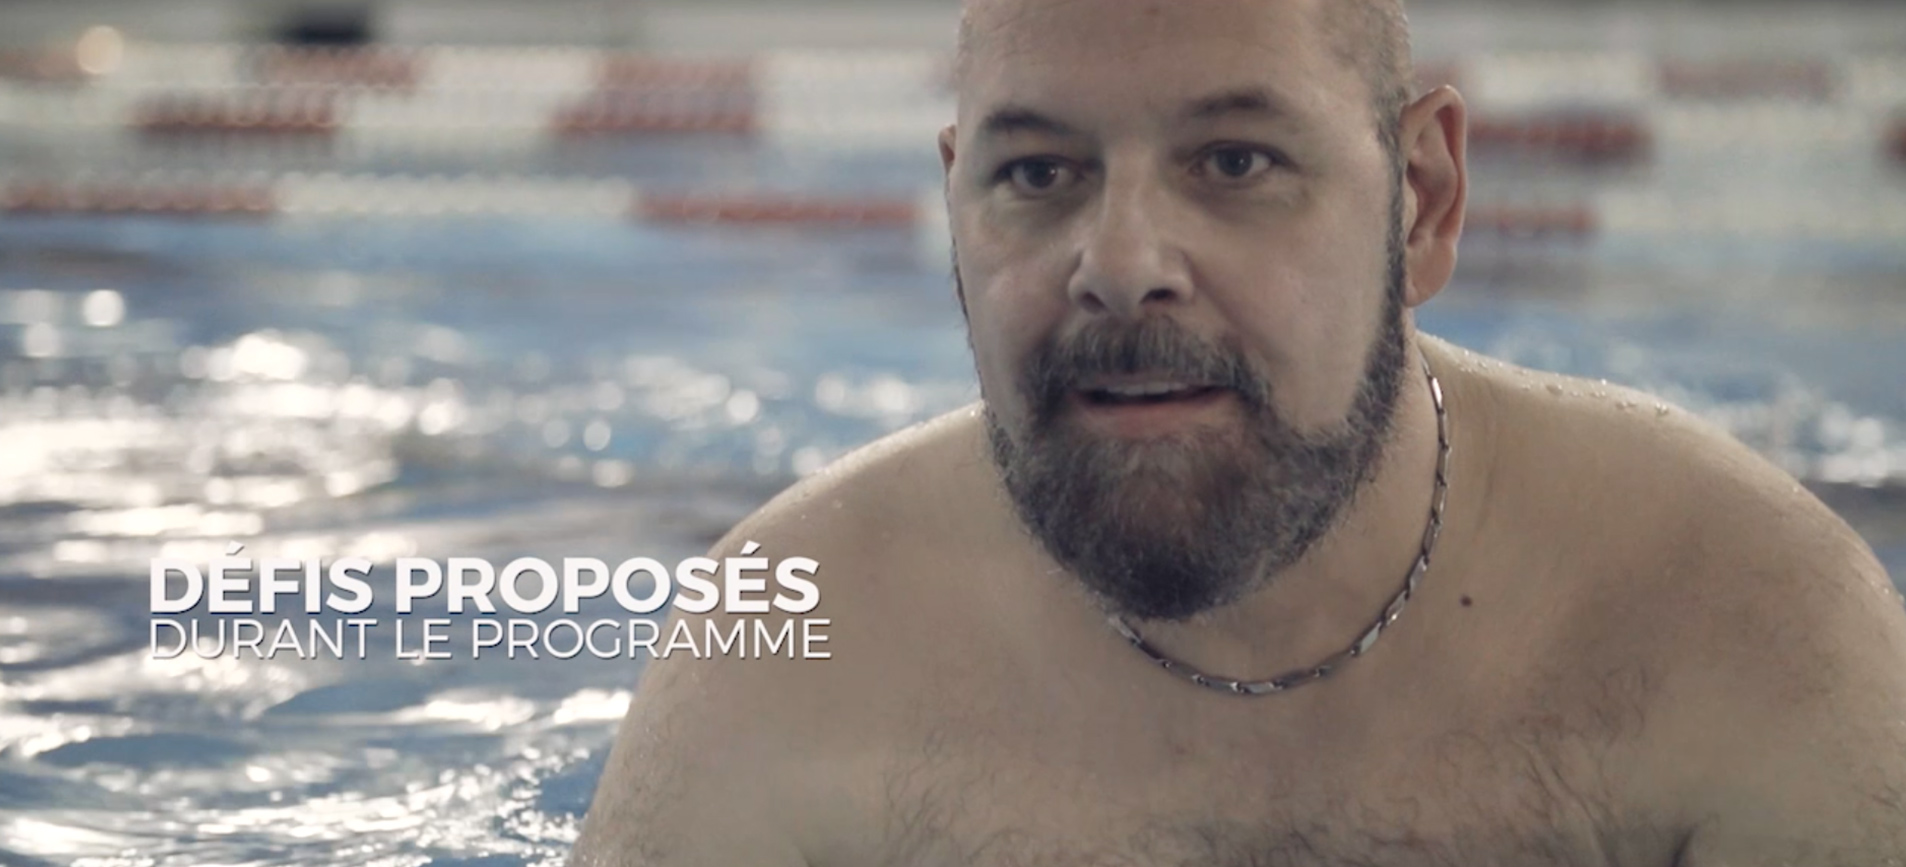 defis_propose_programme